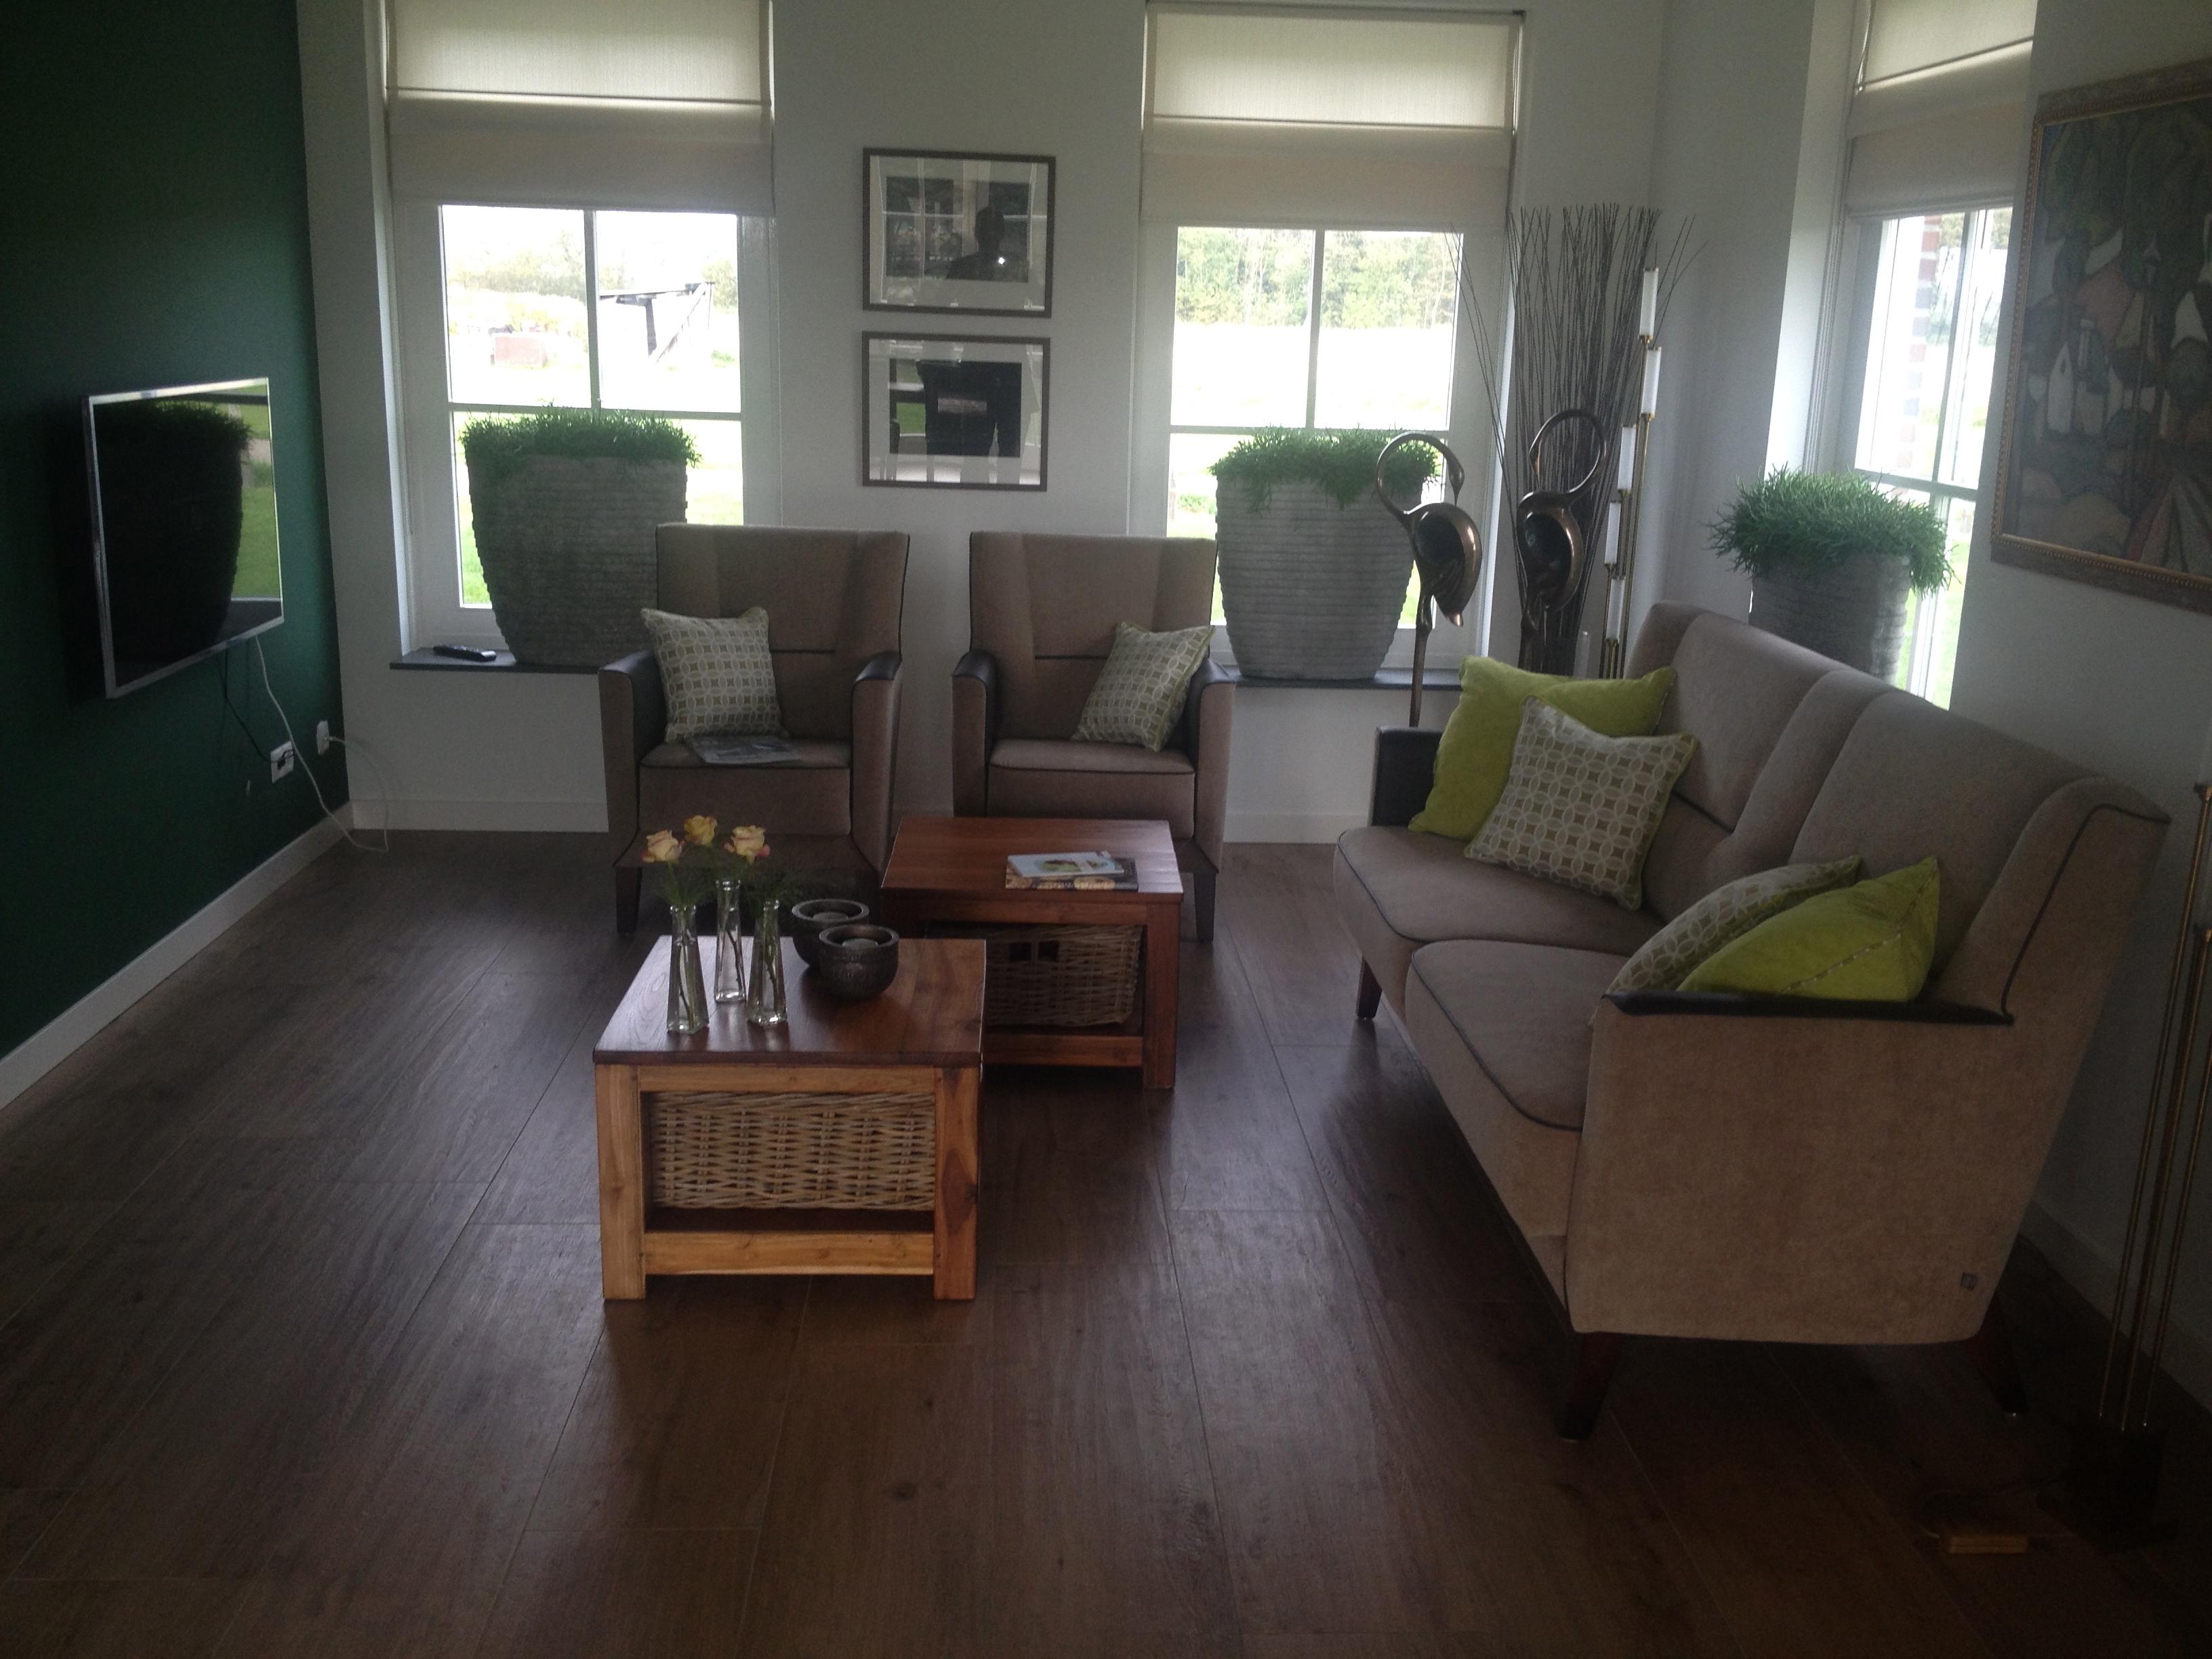 Modern interieur inrichten for Huis laten inrichten